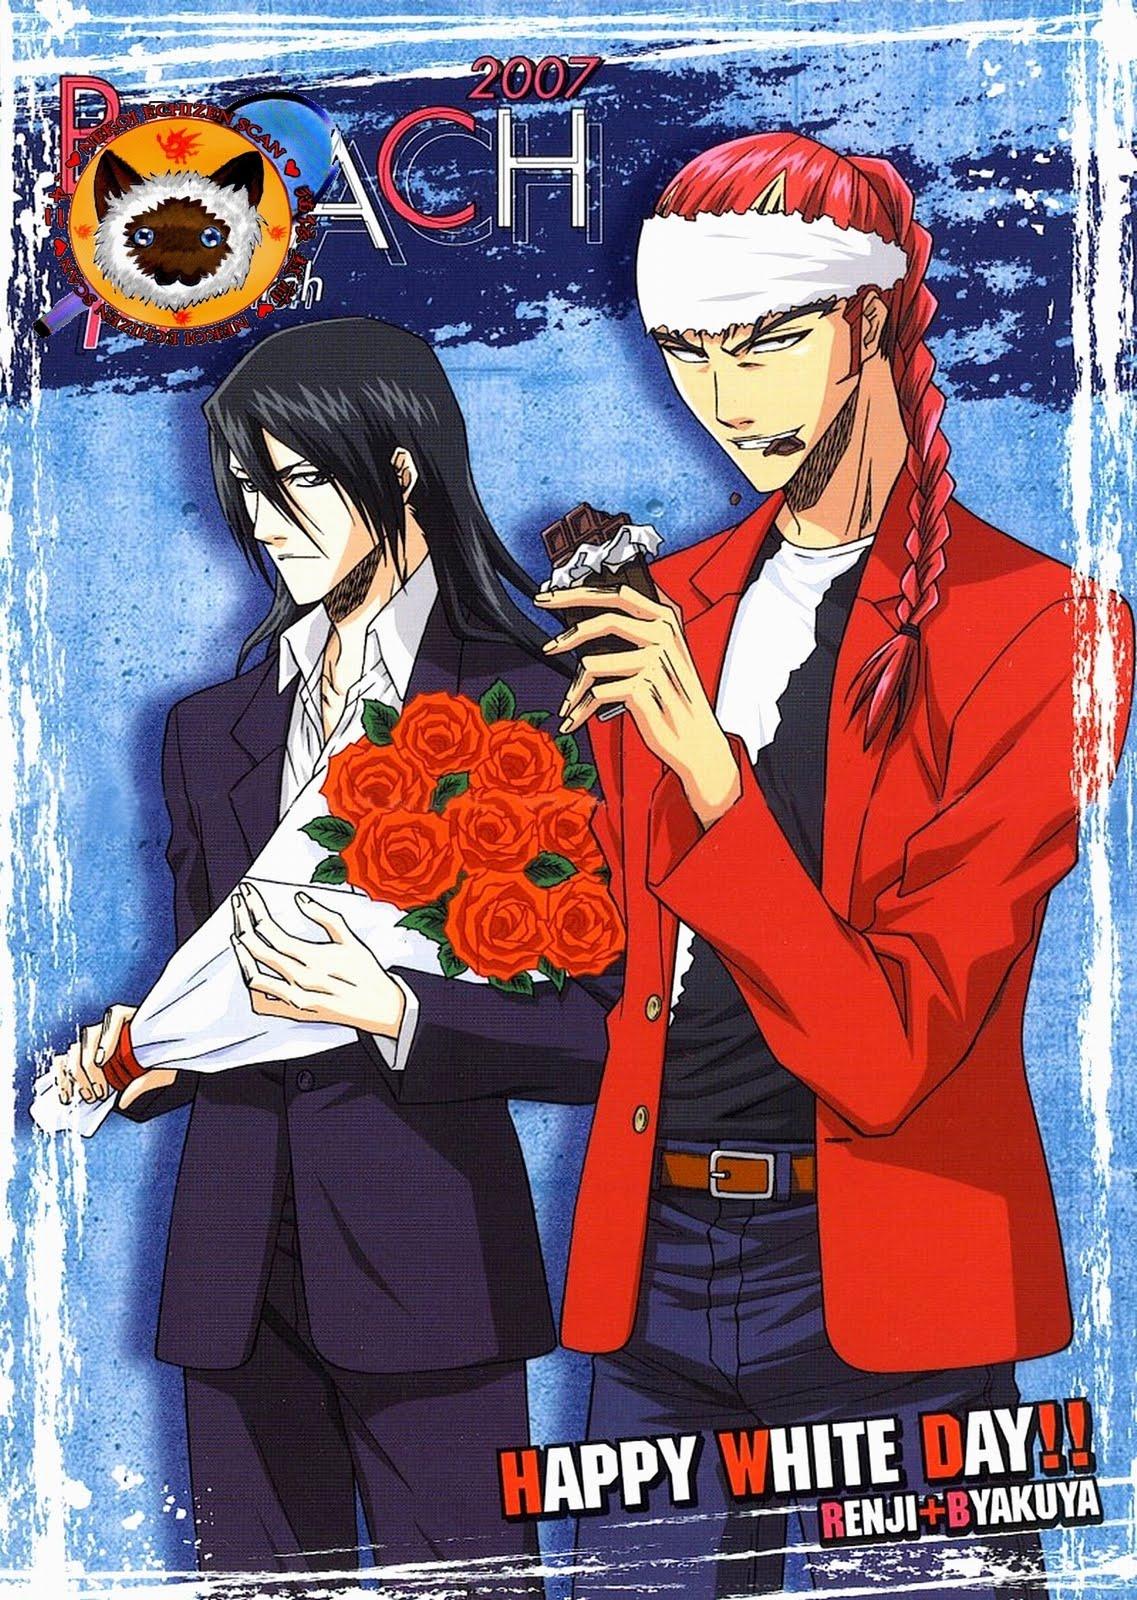 http://3.bp.blogspot.com/-mBfWNGlZP4o/Tg58GCPu0EI/AAAAAAAALZo/w_EEQ-EOsUE/s1600/Byakuya-and-Renji-bleach-anime-17365554-1350-1900.jpg